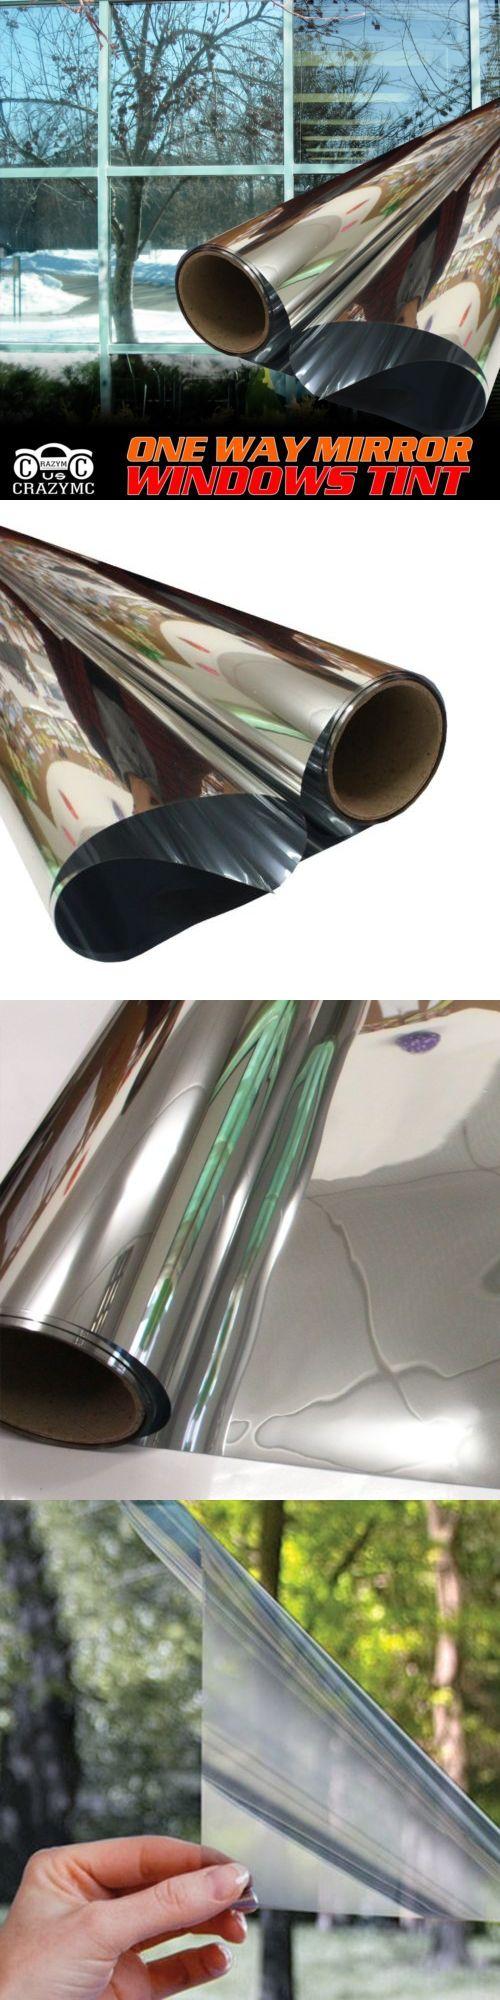 One Way Mirror Privacy Reflection Window Tint Film Solar Reflective Kaca Oneway Premium 175757 House Sunscreen Glass Sticker Buy It Now Only 3476 On Ebay